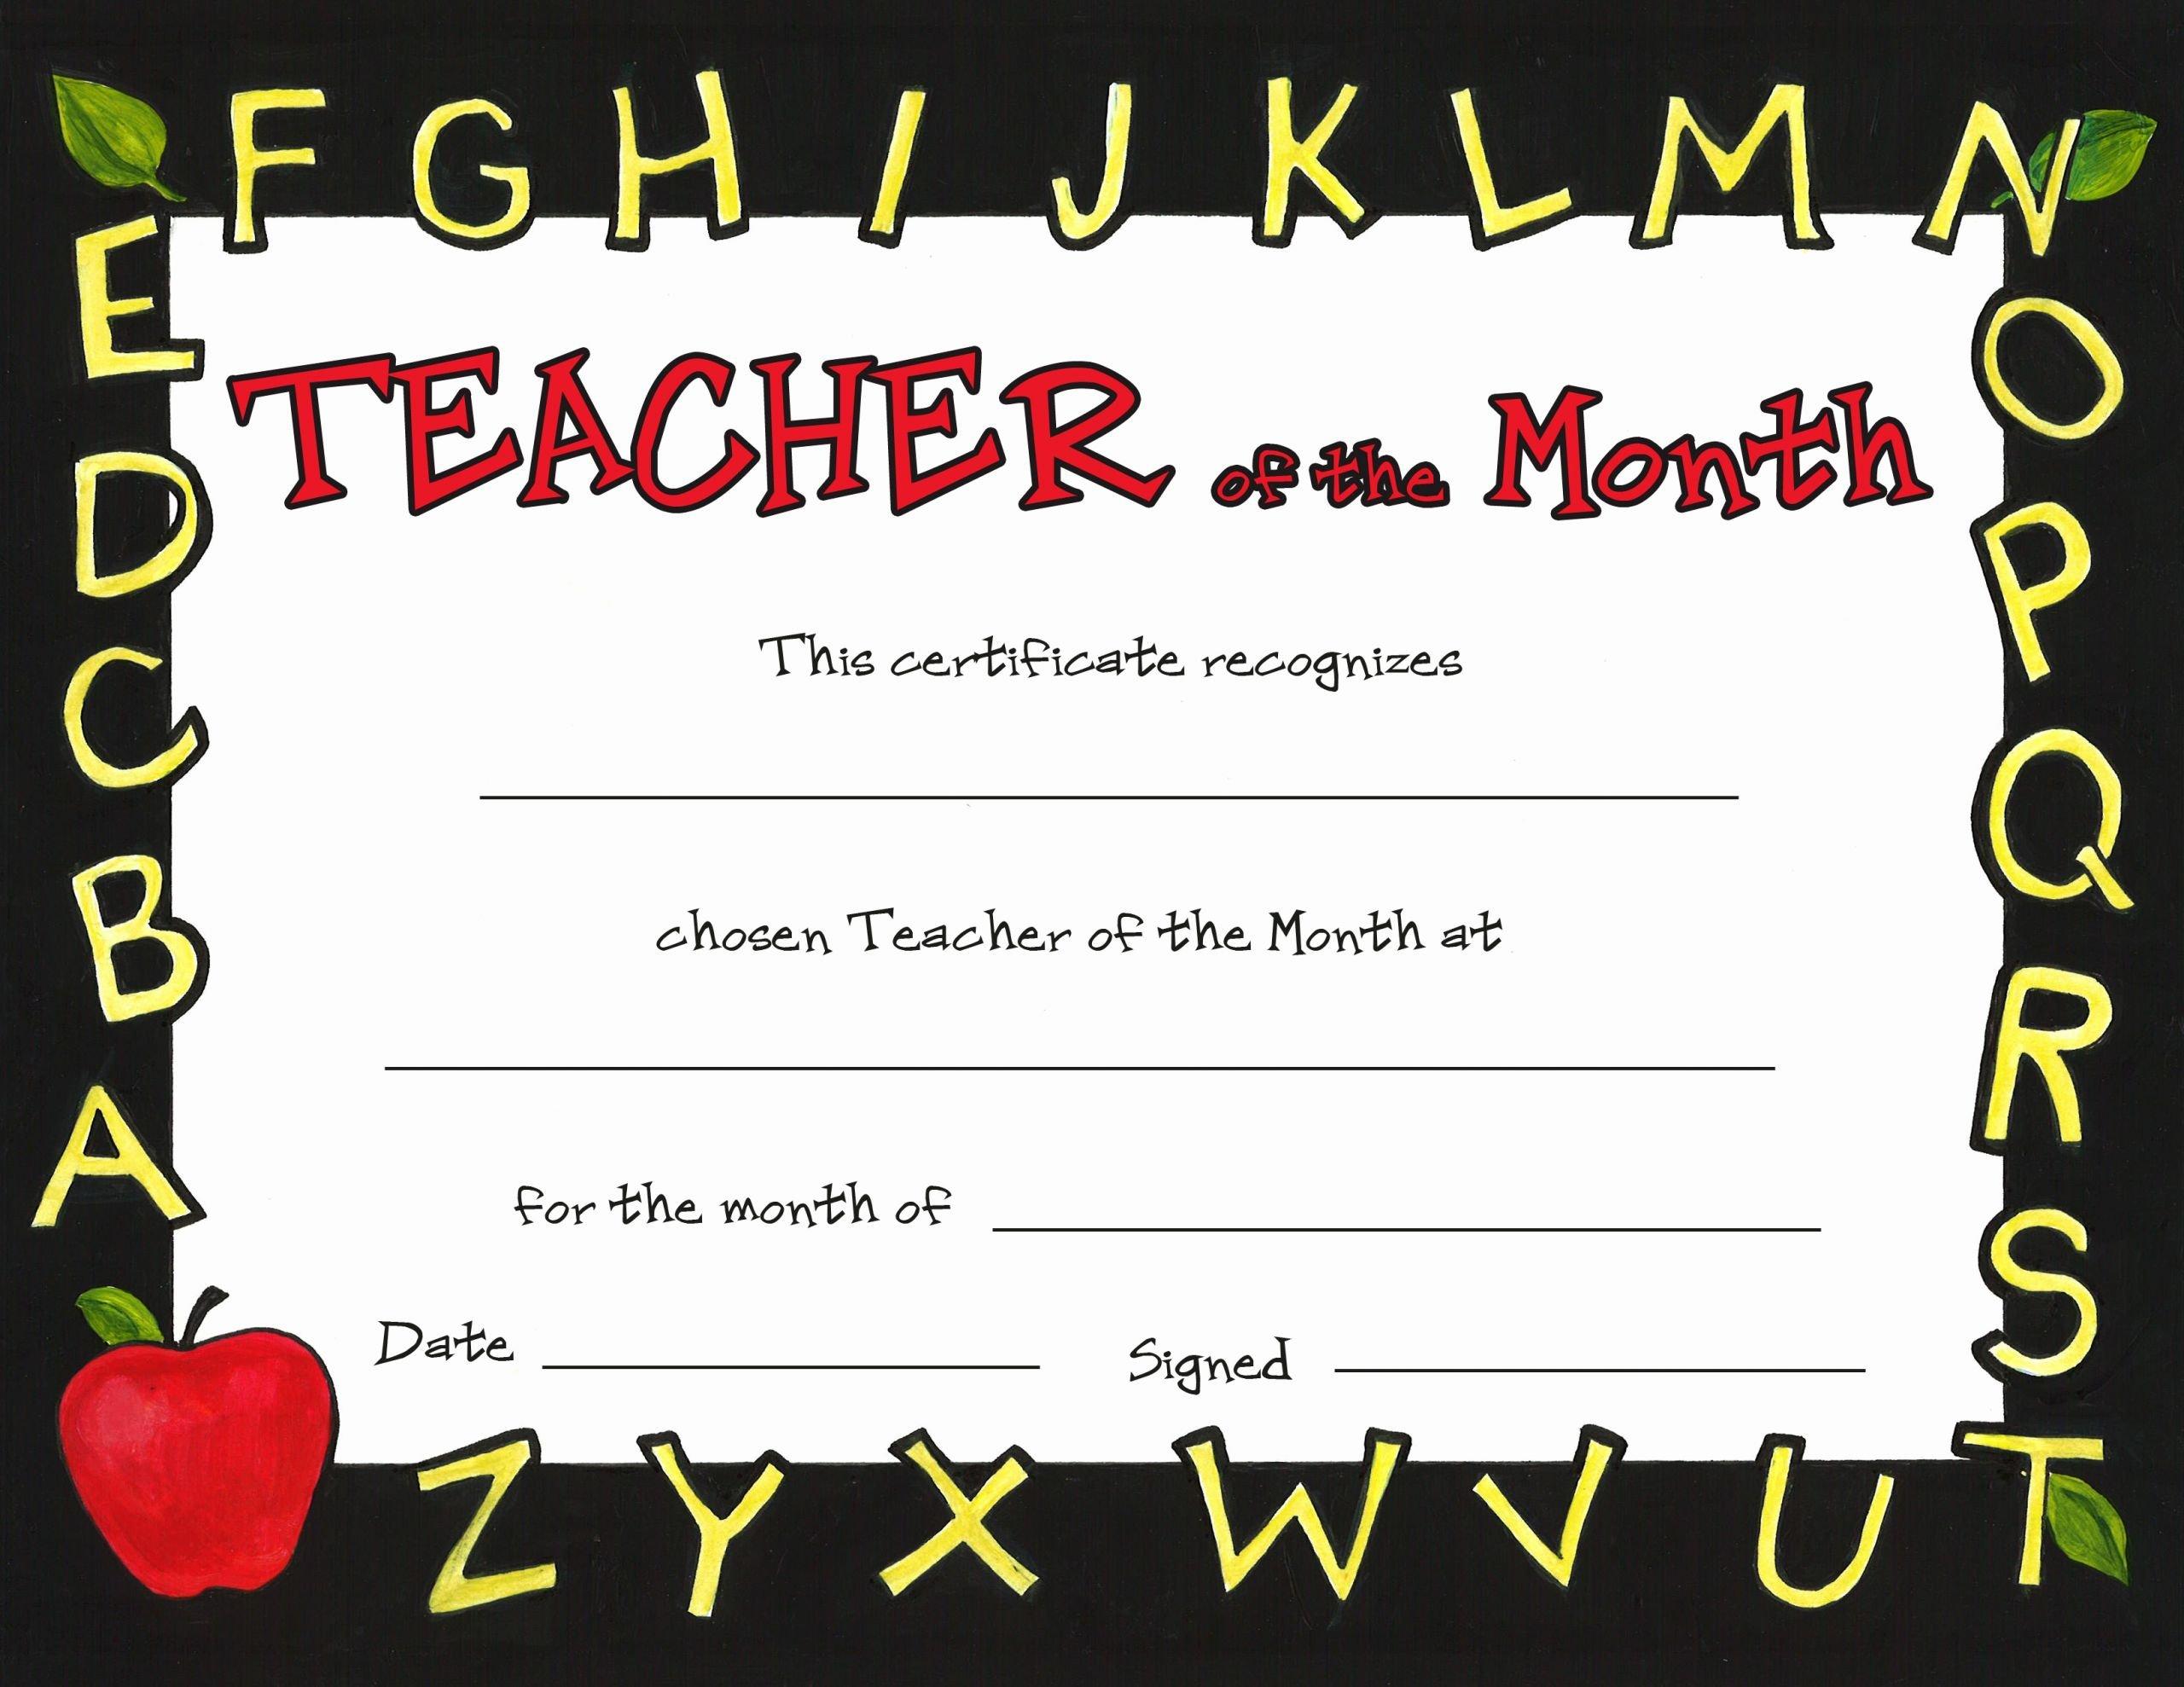 Teacher Of the Month Certificate Template Fresh Teacher Of the Month